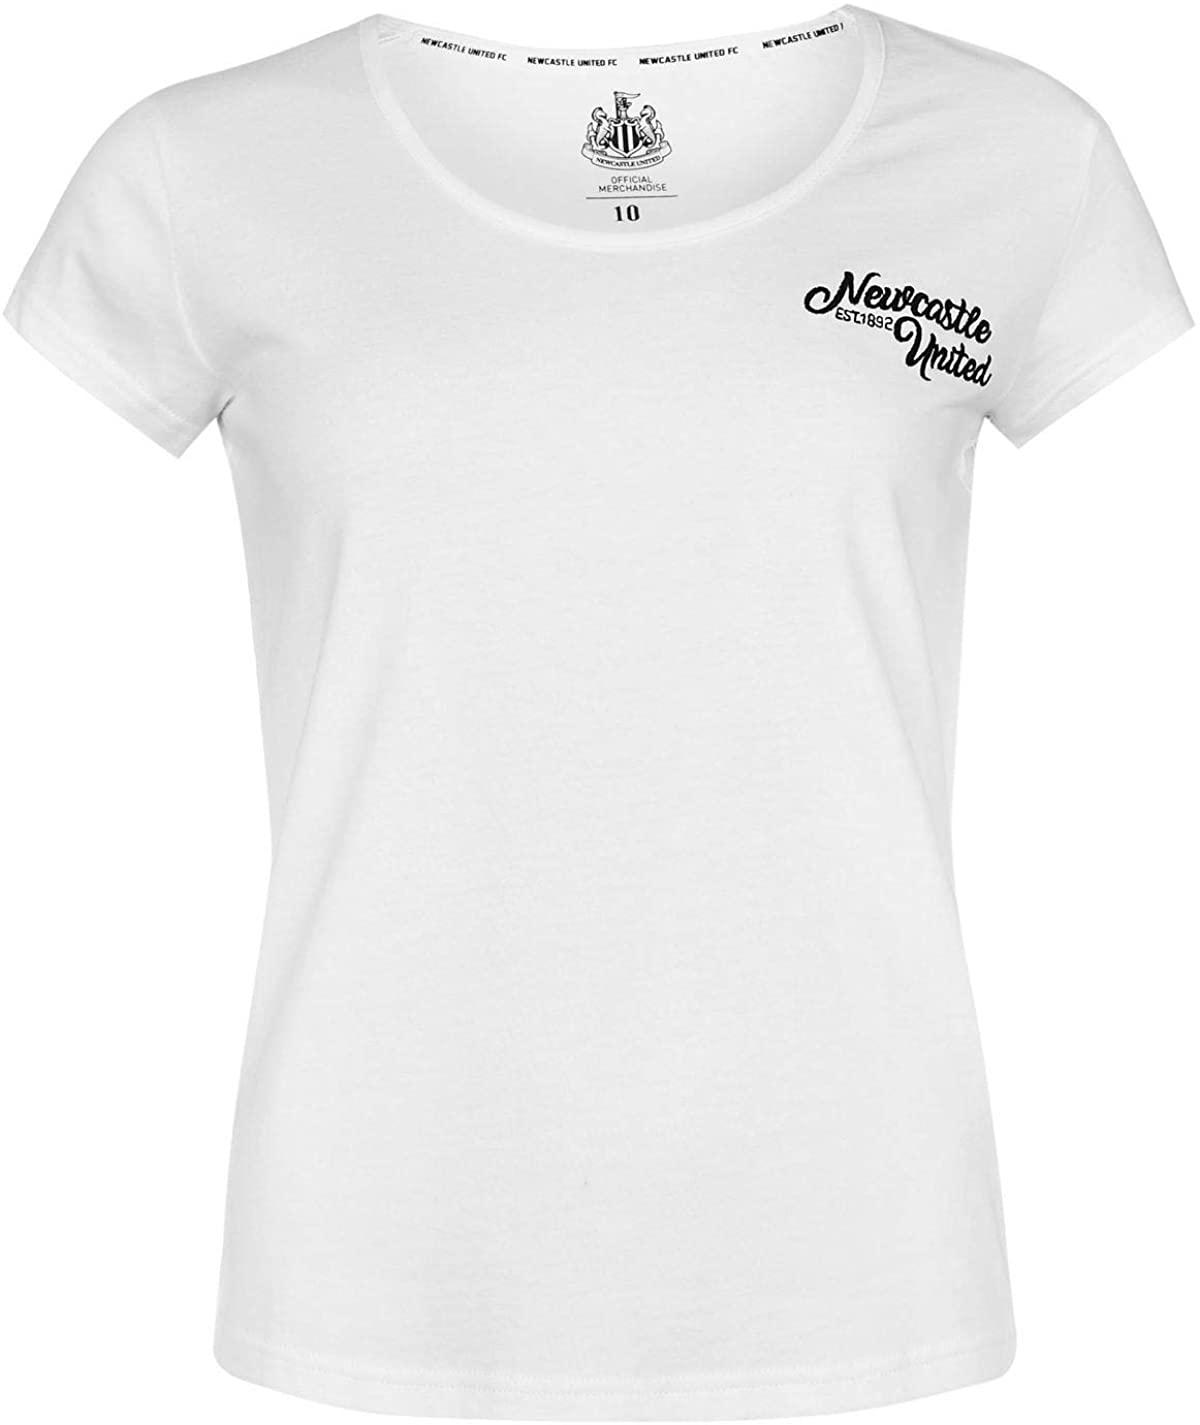 NUFC Newcastle United Script T-Shirt Womens Football Soccer Fan Top Tee Shirt White UK 14 (Large)